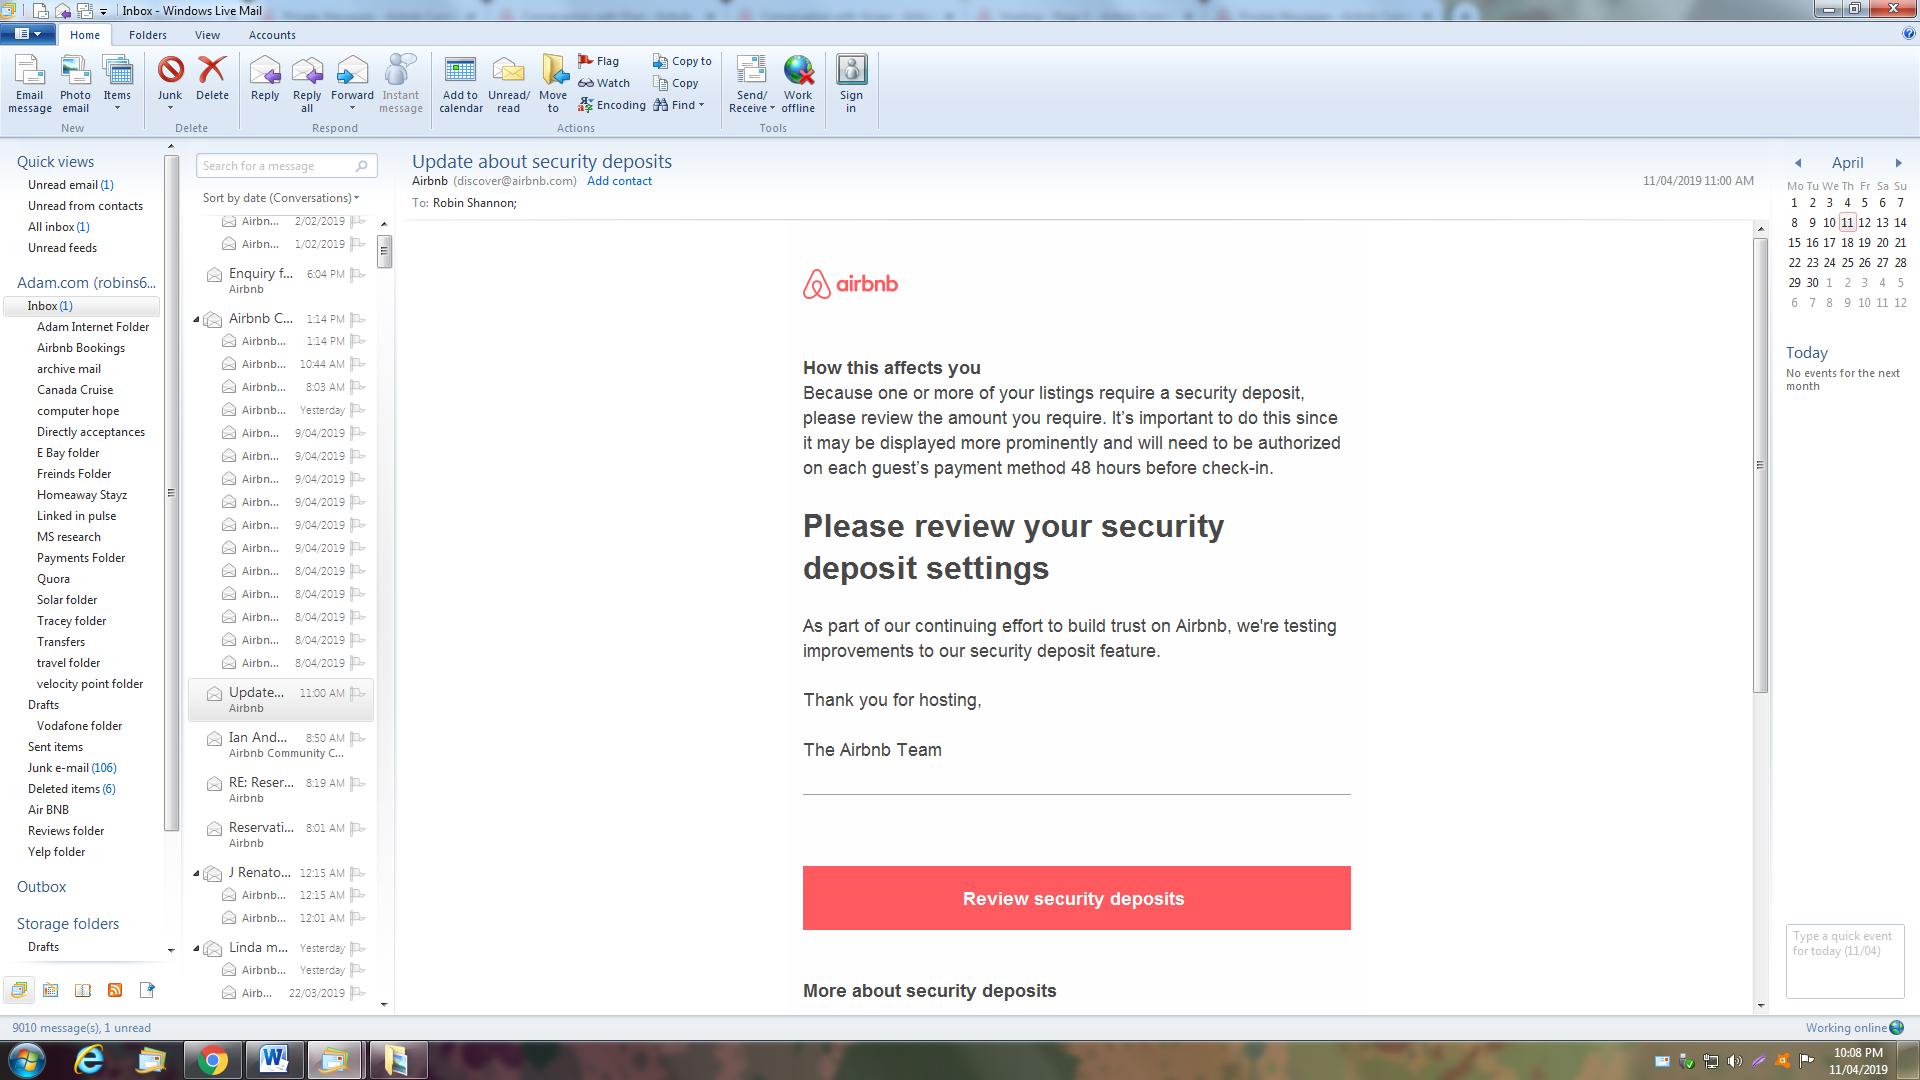 Security deposit - Airbnb Community